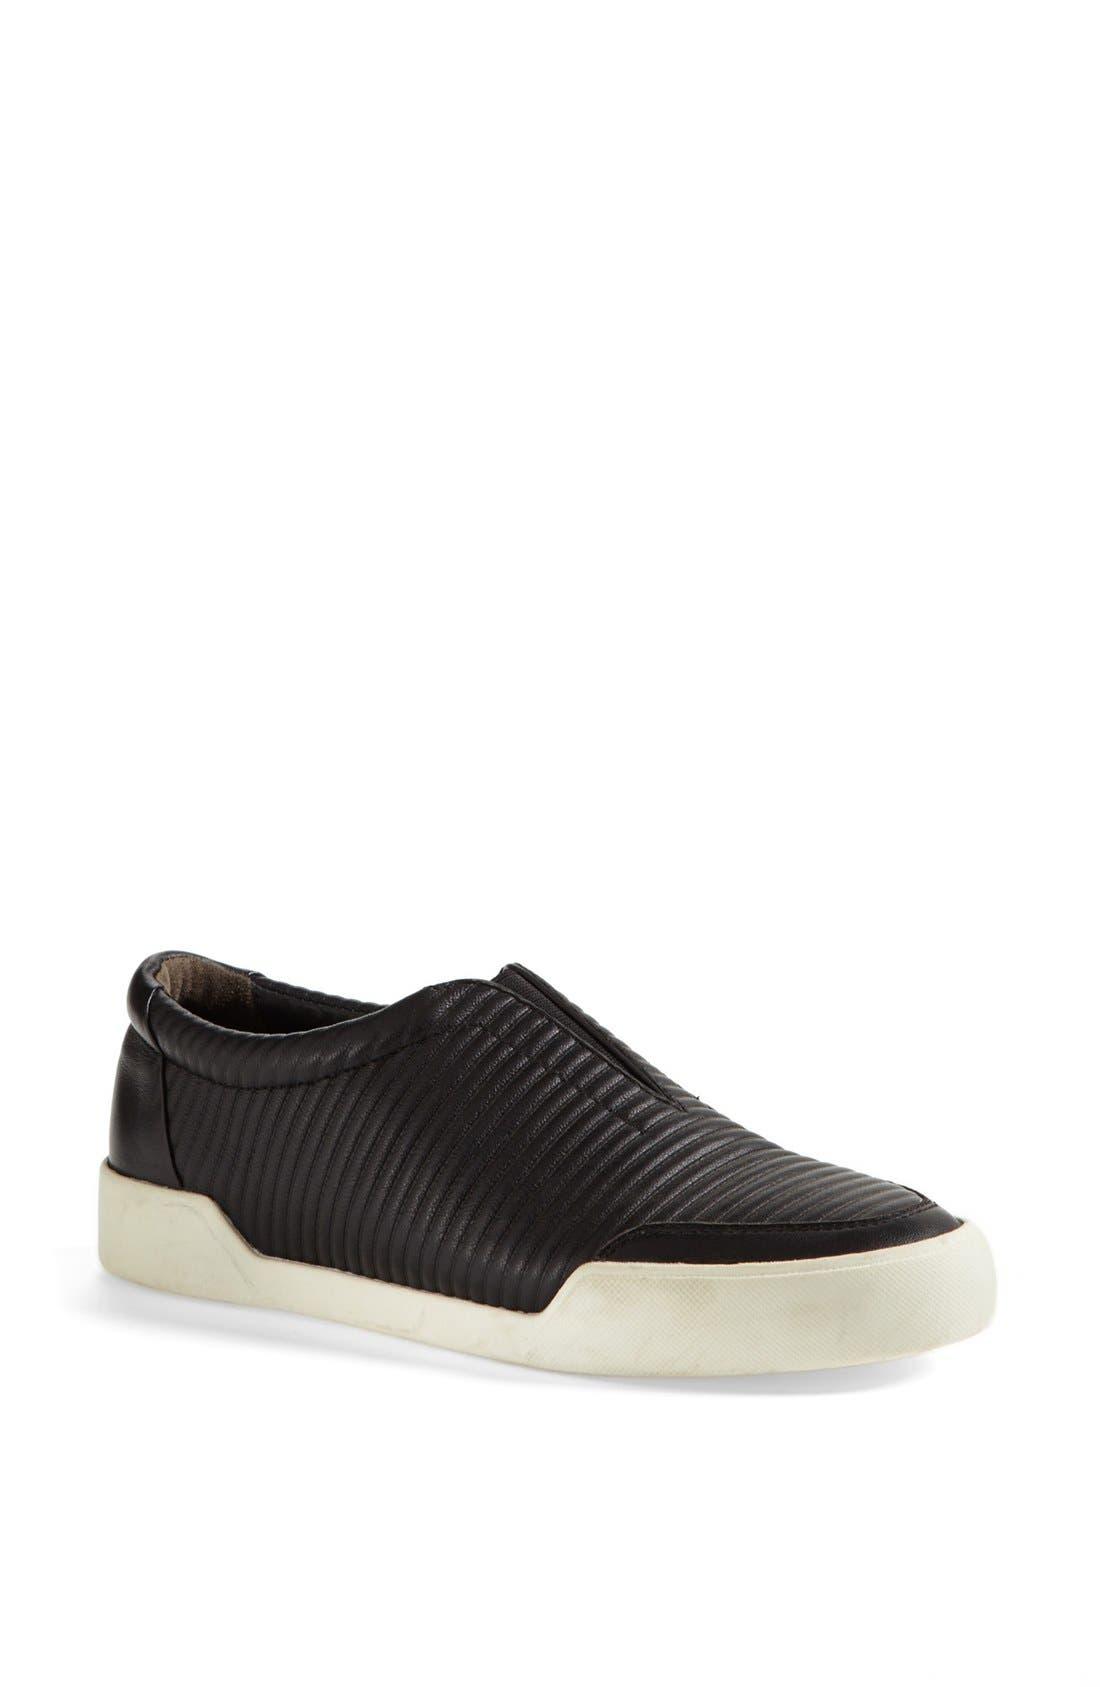 'Morgan' Slip-On Sneaker,                         Main,                         color, Black